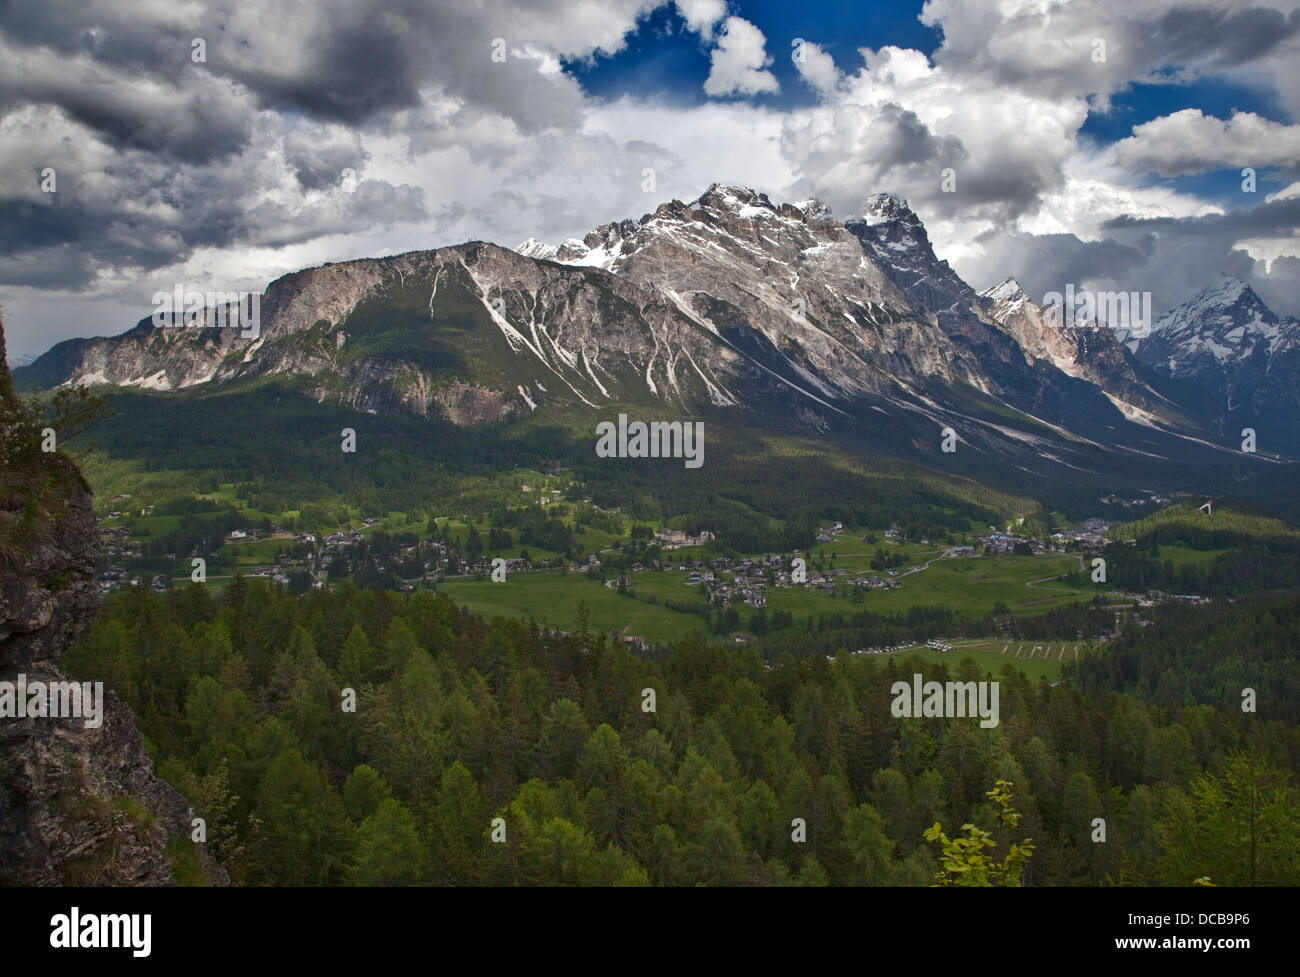 Cortina d'Ampezzo, Dolomites, Italy - Stock Image